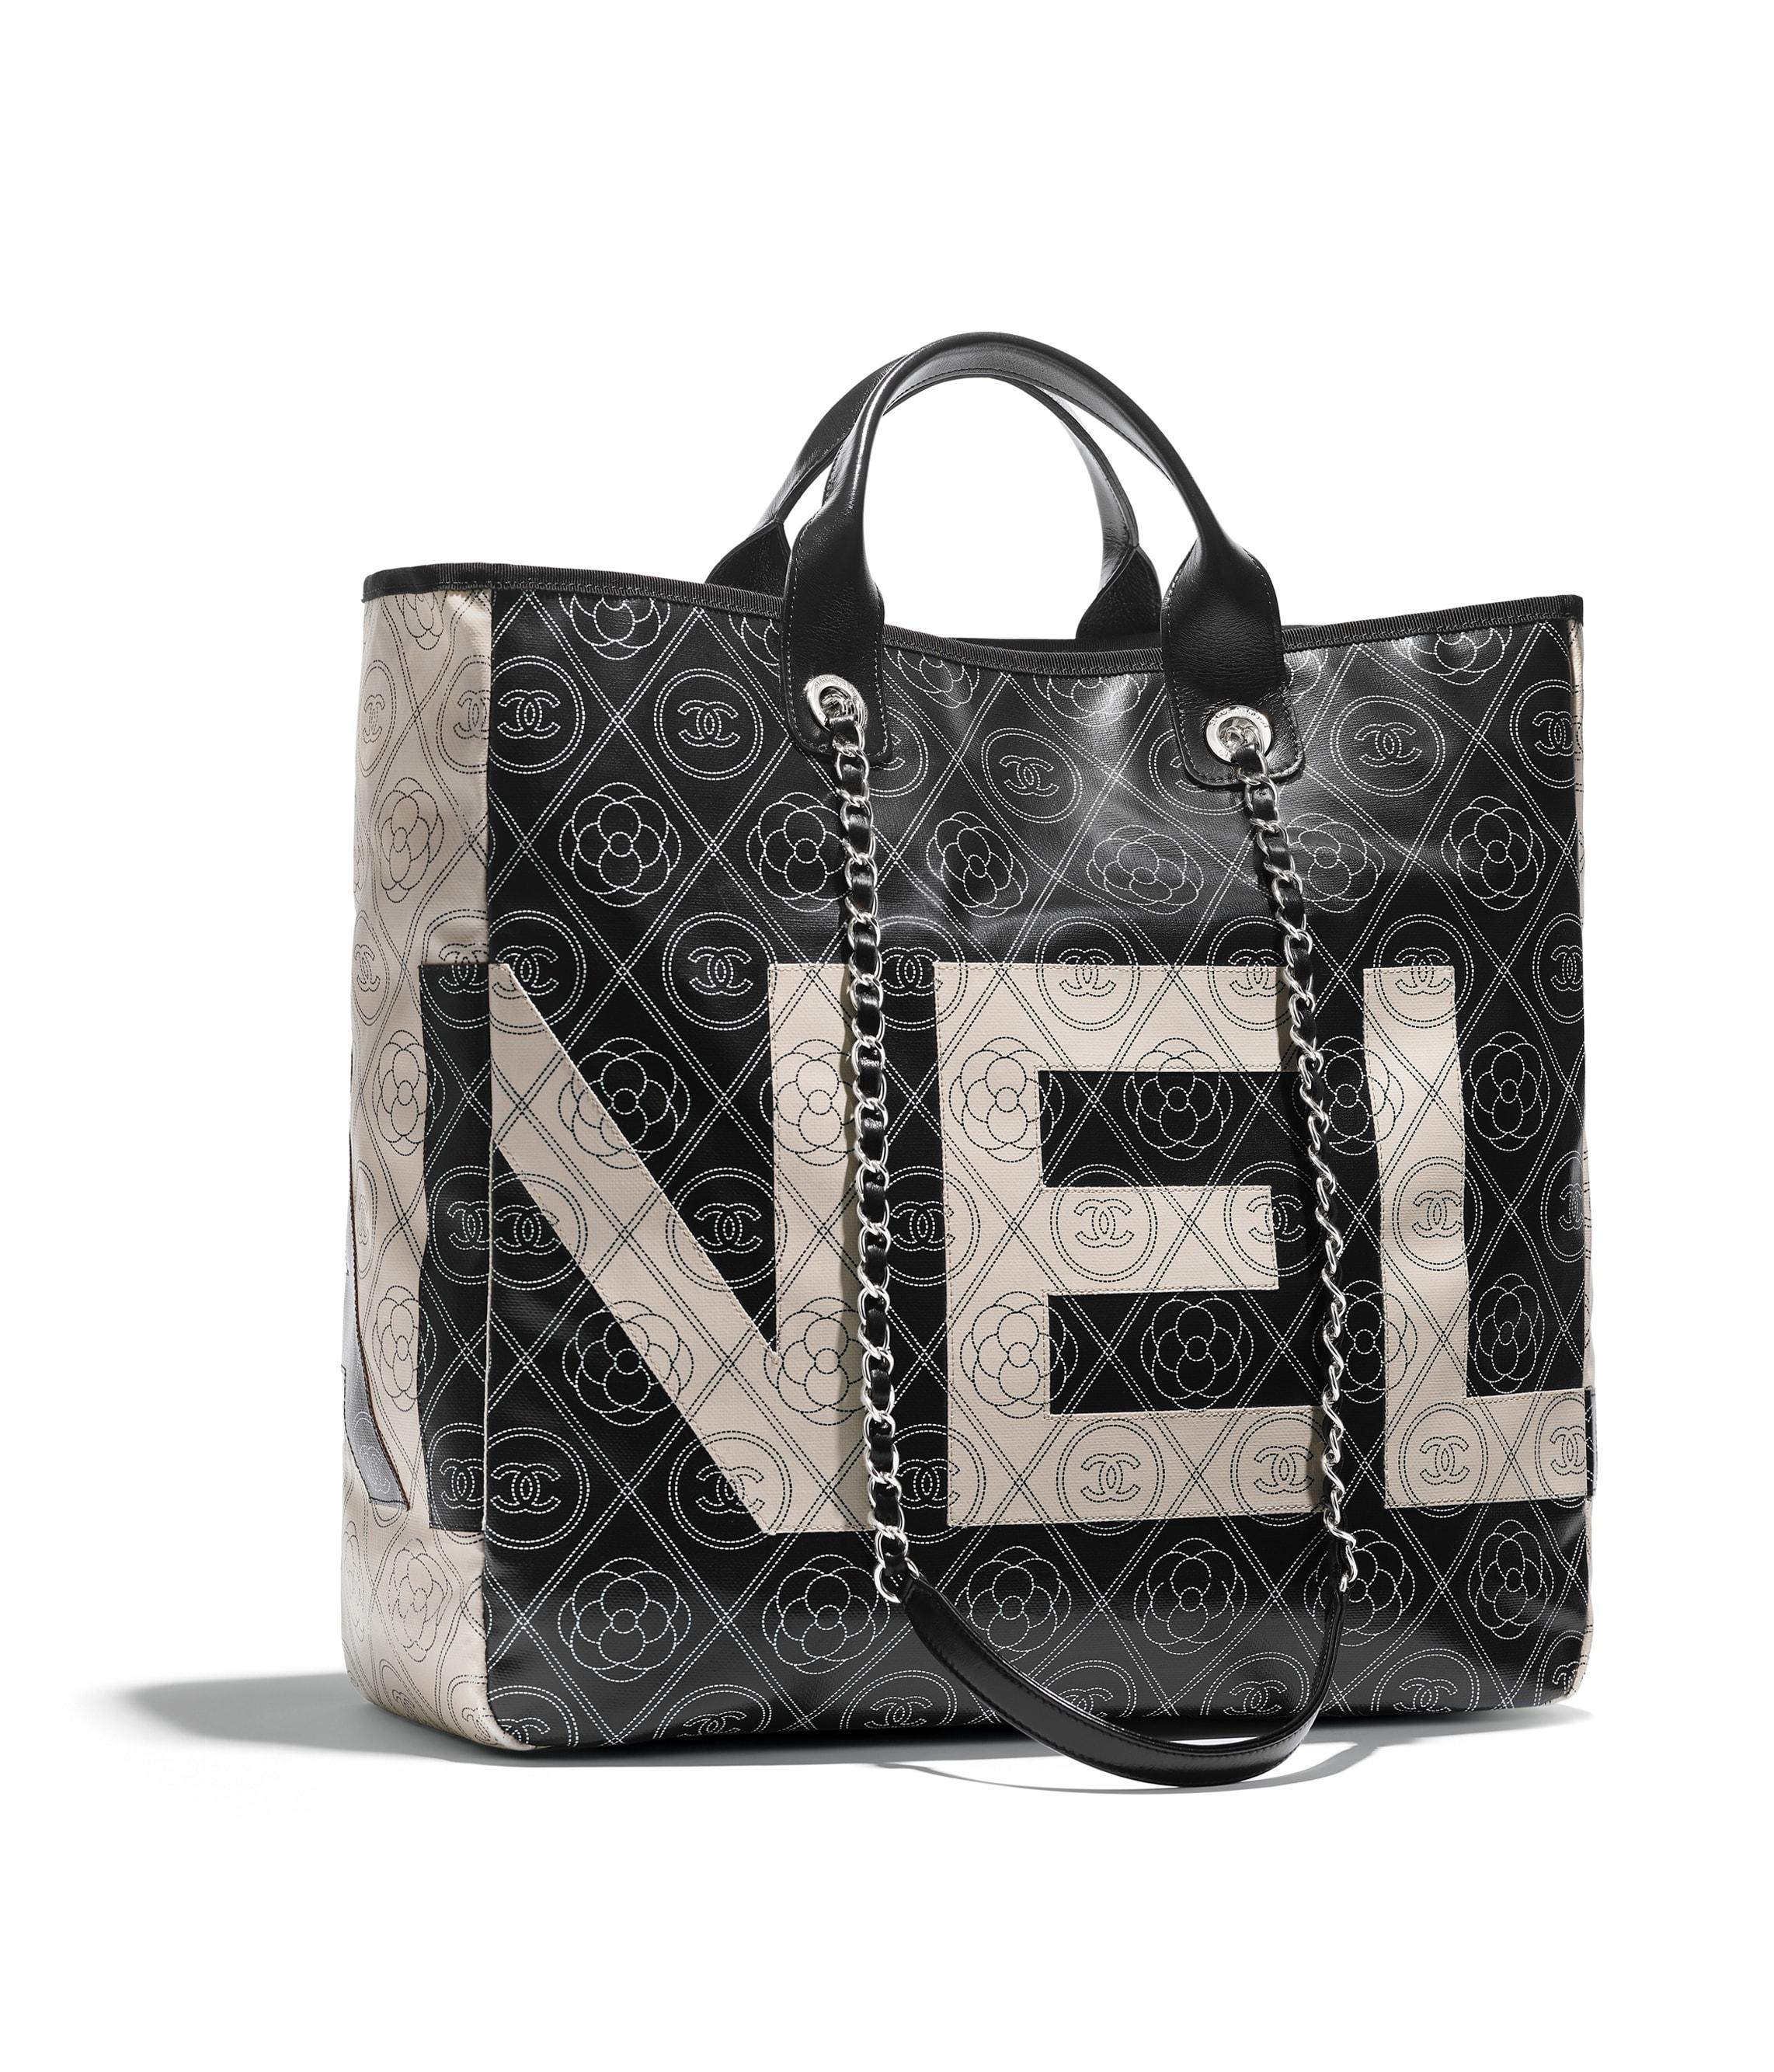 ea805e7db25377 Chanel Printed Canvas Large Shopping Bag A57161 Black | Stanford ...